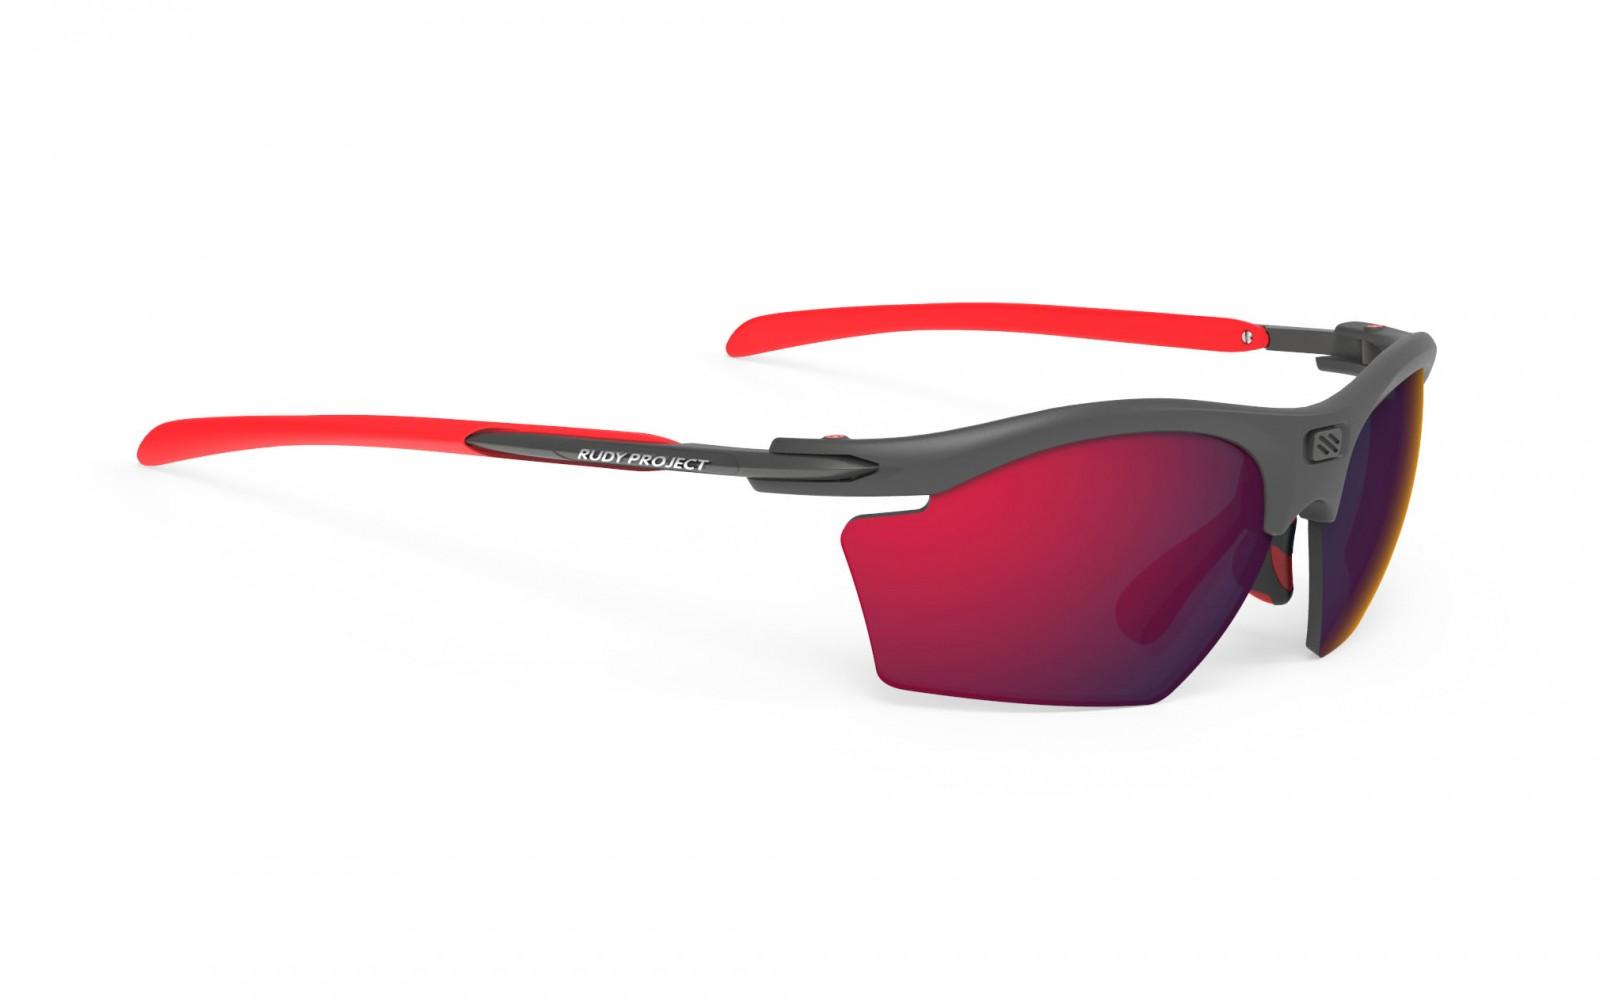 RYDON SLIM Graphite / Polar 3FX HDR Multilaser Red